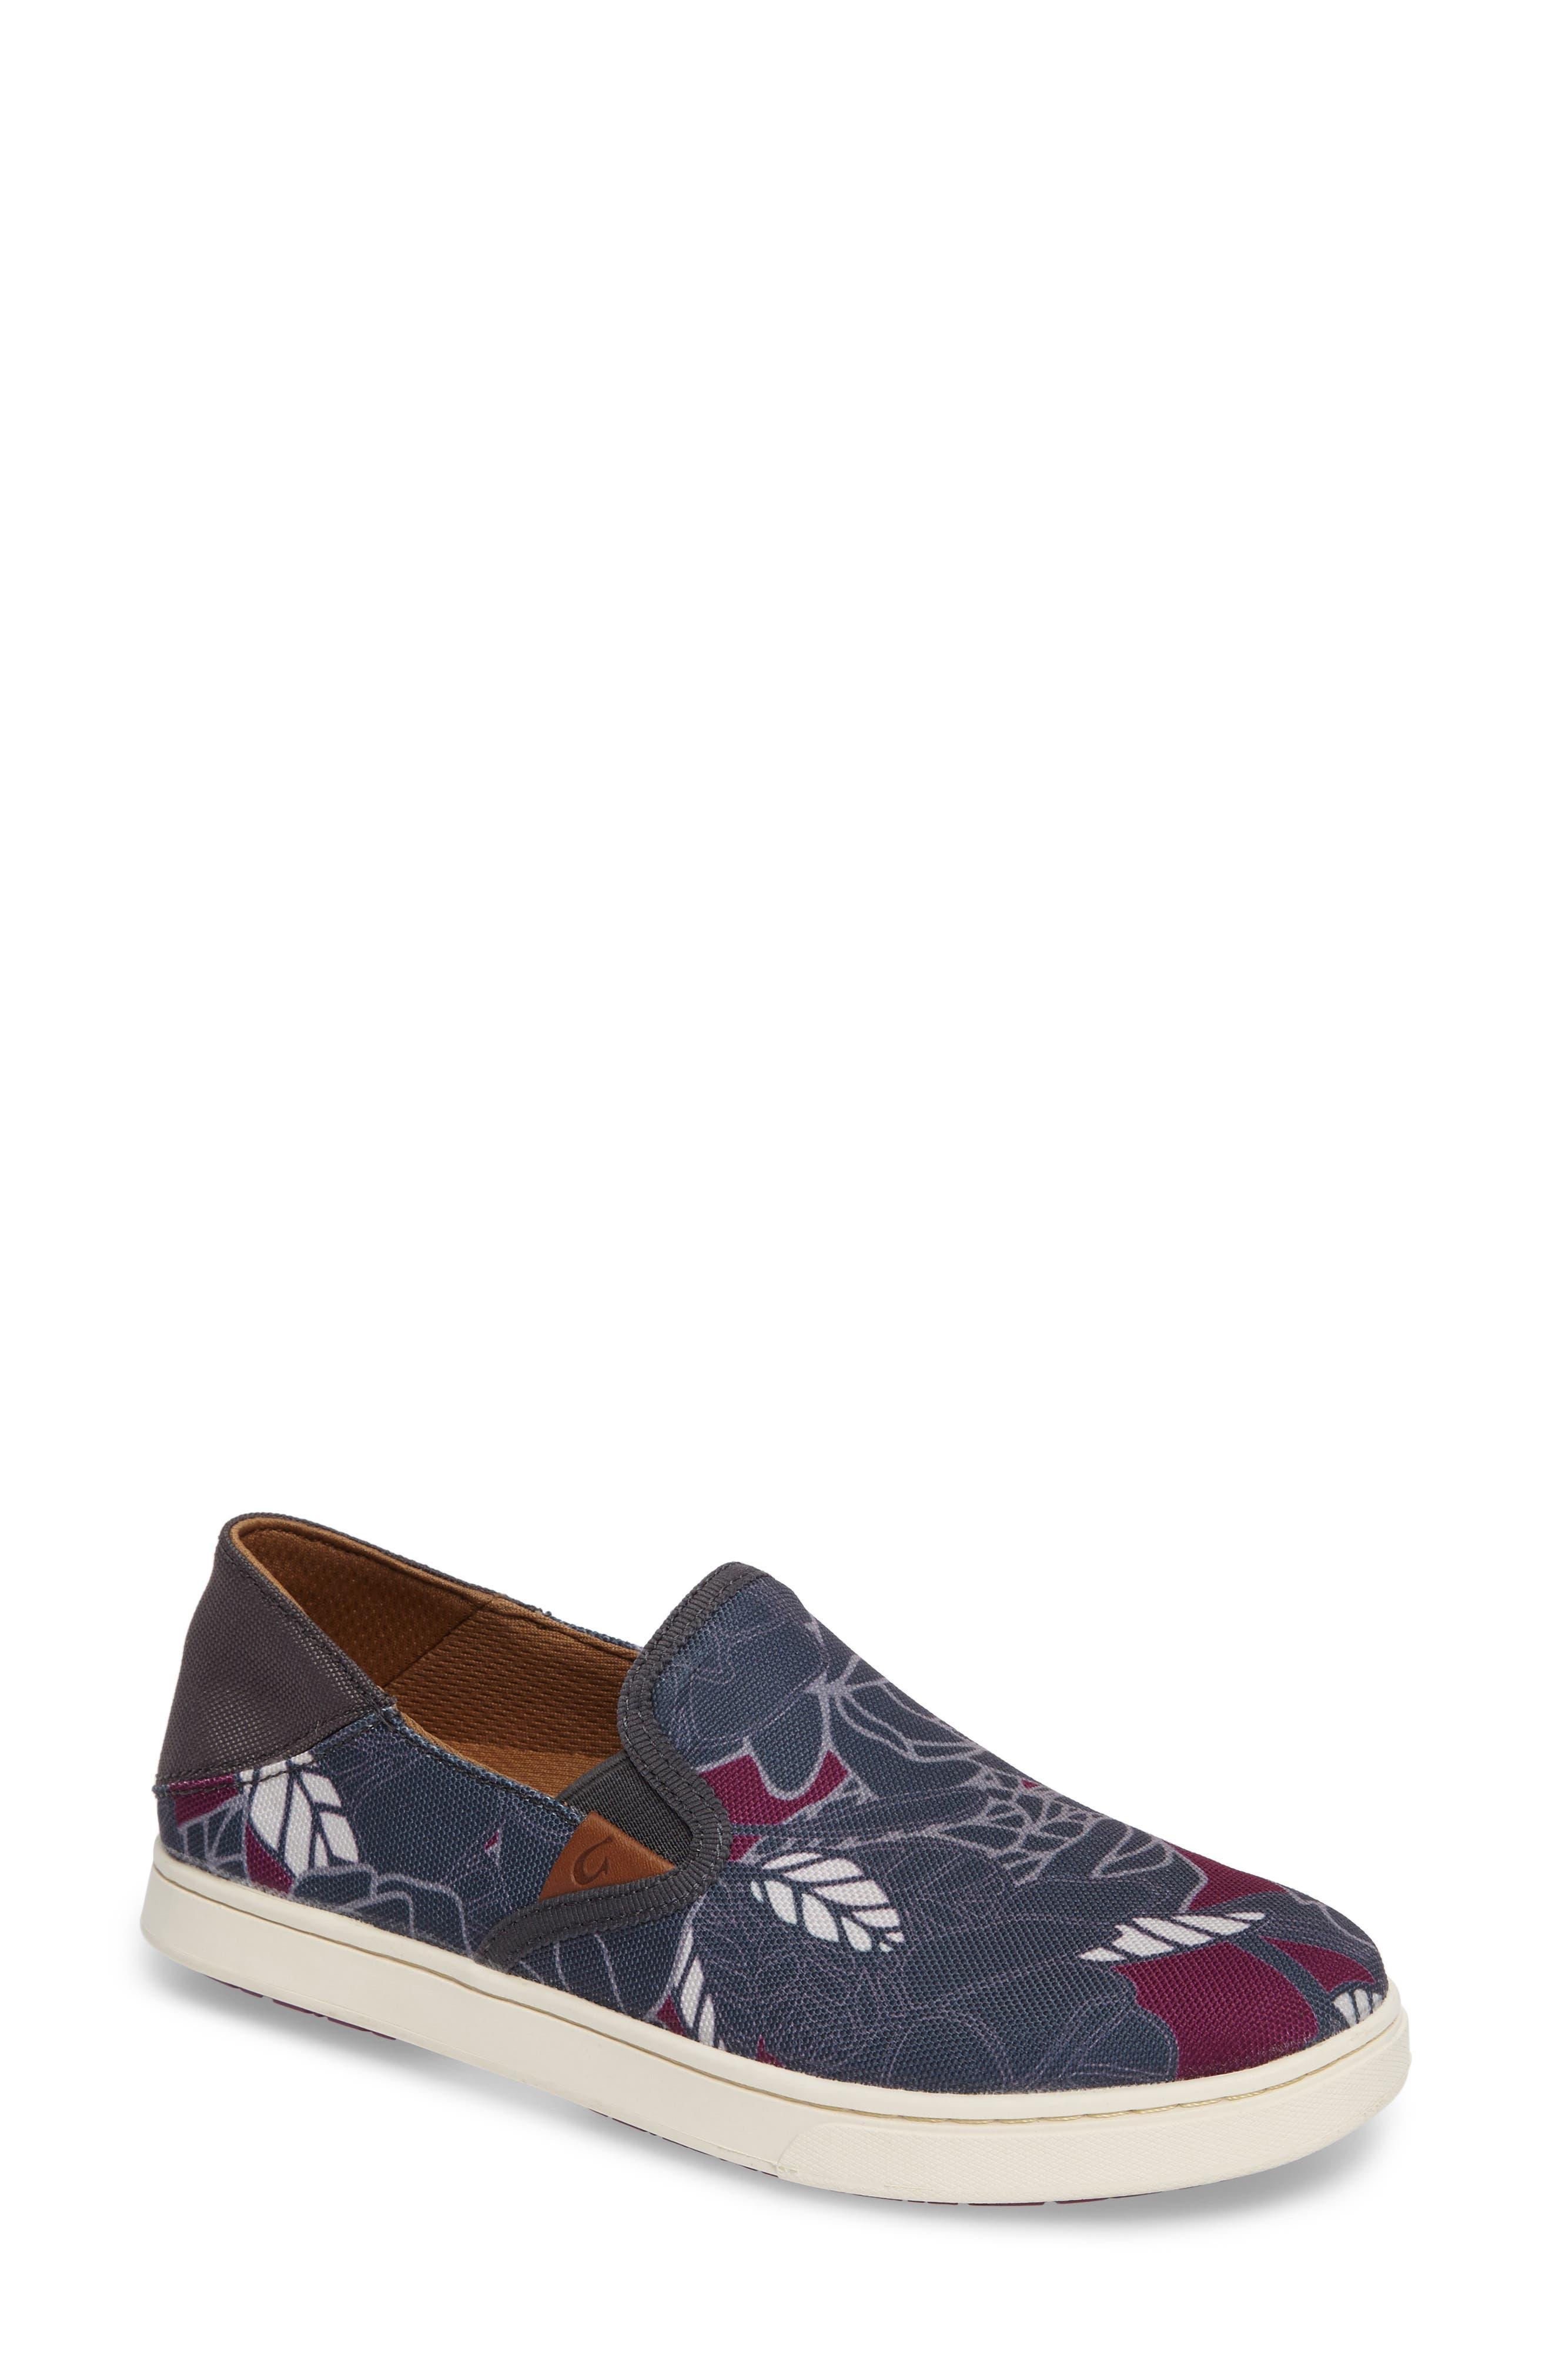 Pehuea Print Slip-On Sneaker,                             Main thumbnail 1, color,                             027